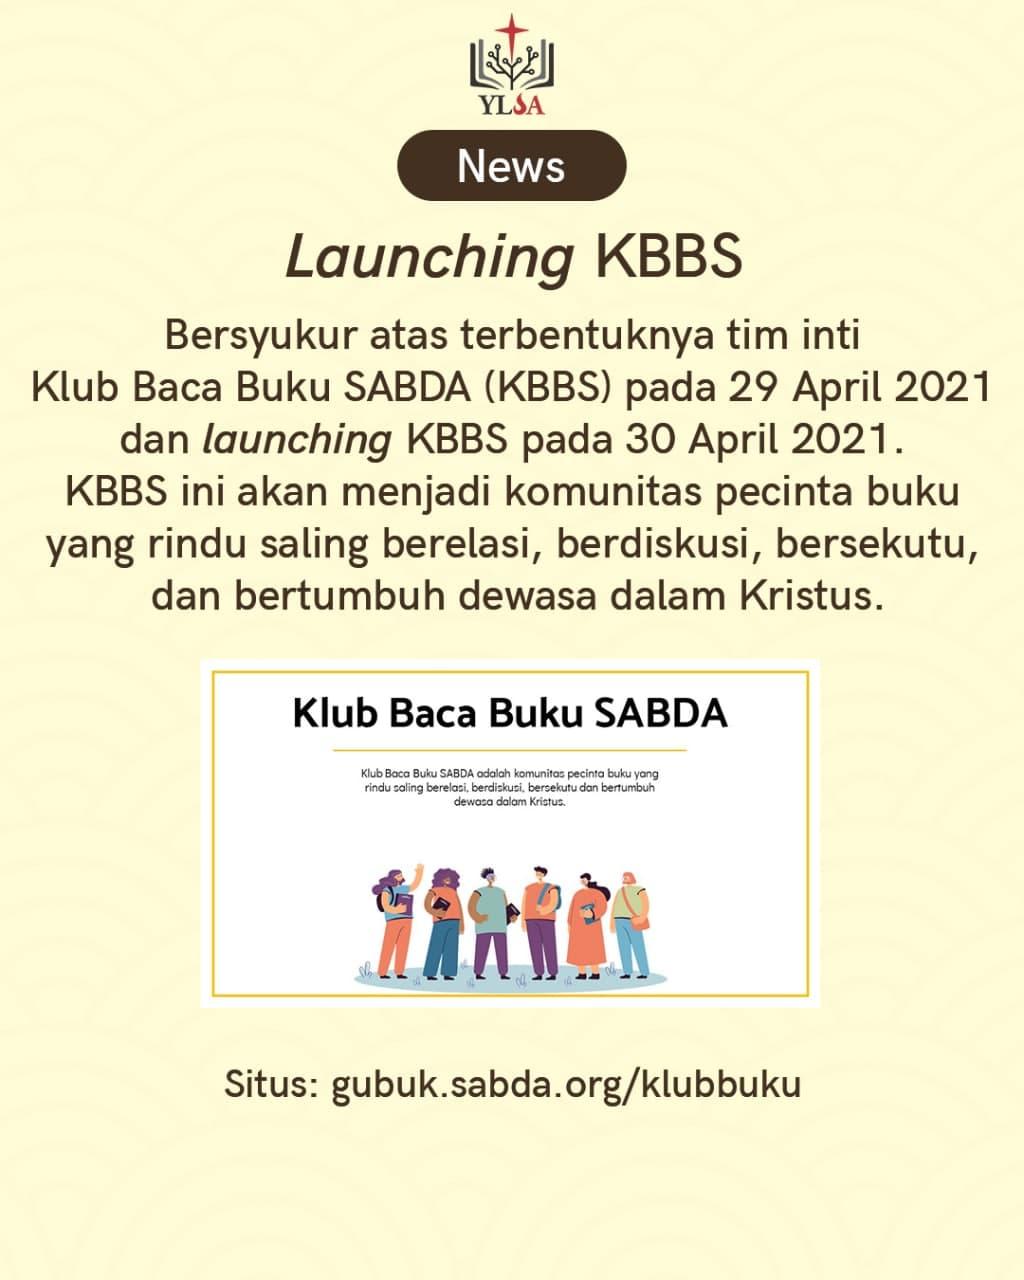 Bersyukur atas terbentuknya Klub Baca Buku SABDA (KBBS), komunitas pecinta buku yang rindu saling berelasi, berdiskusi, bersekutu dan bertumbuh dewasa dalam Kristus.